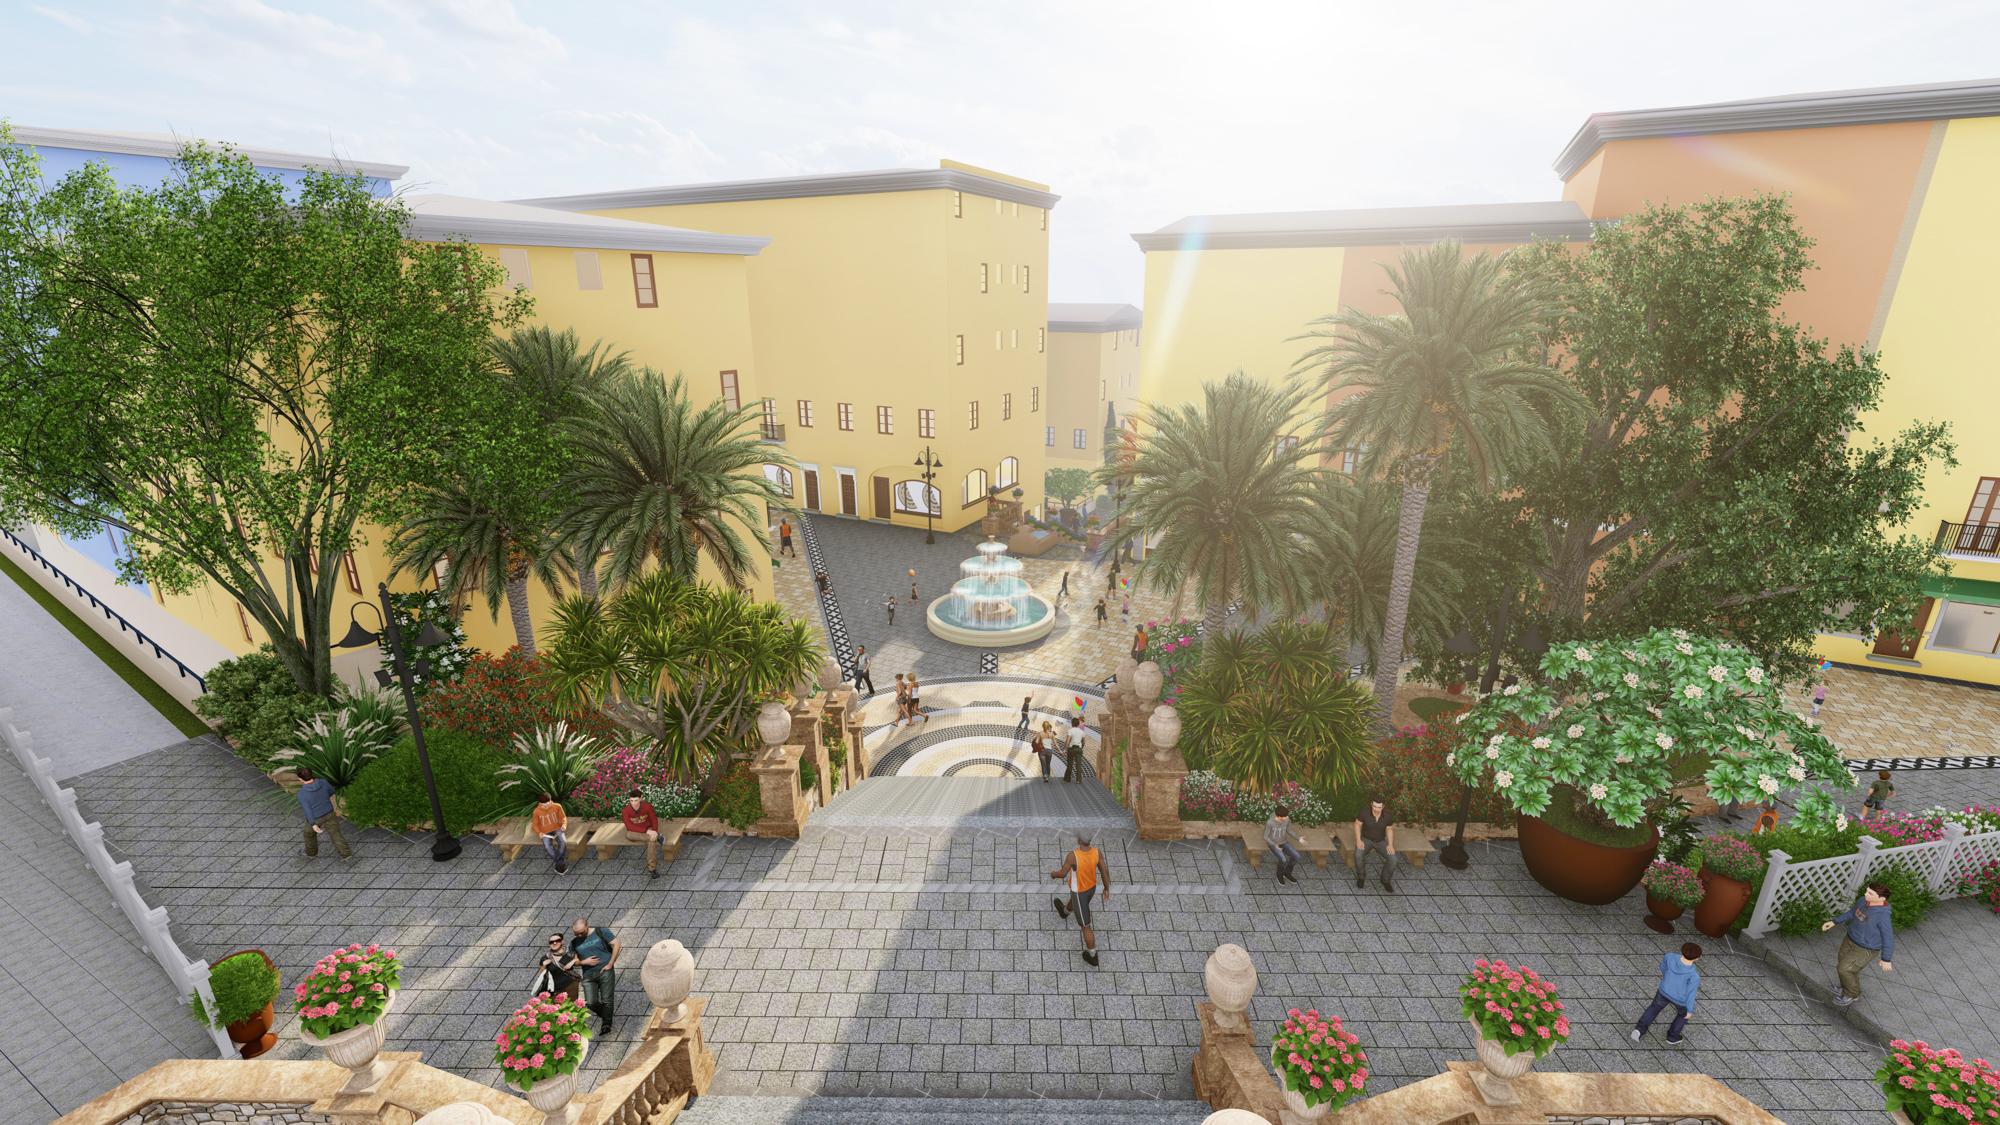 The special feature when designing the Sun Premier Village Primavera landscape was the terrain factor.